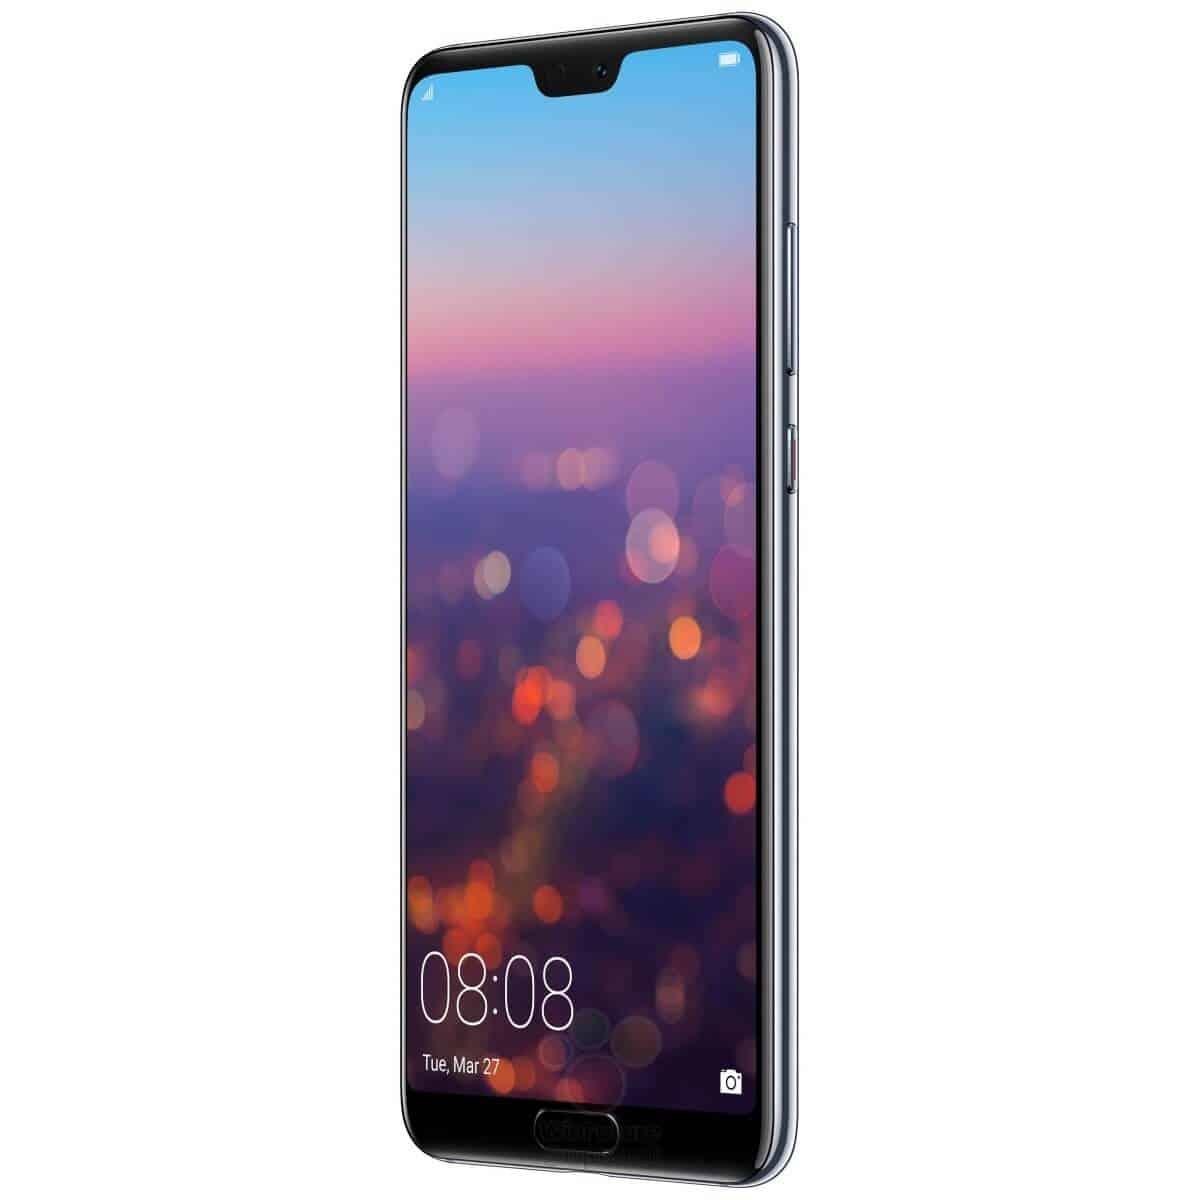 Huawei P20 Pro Press Renders 4